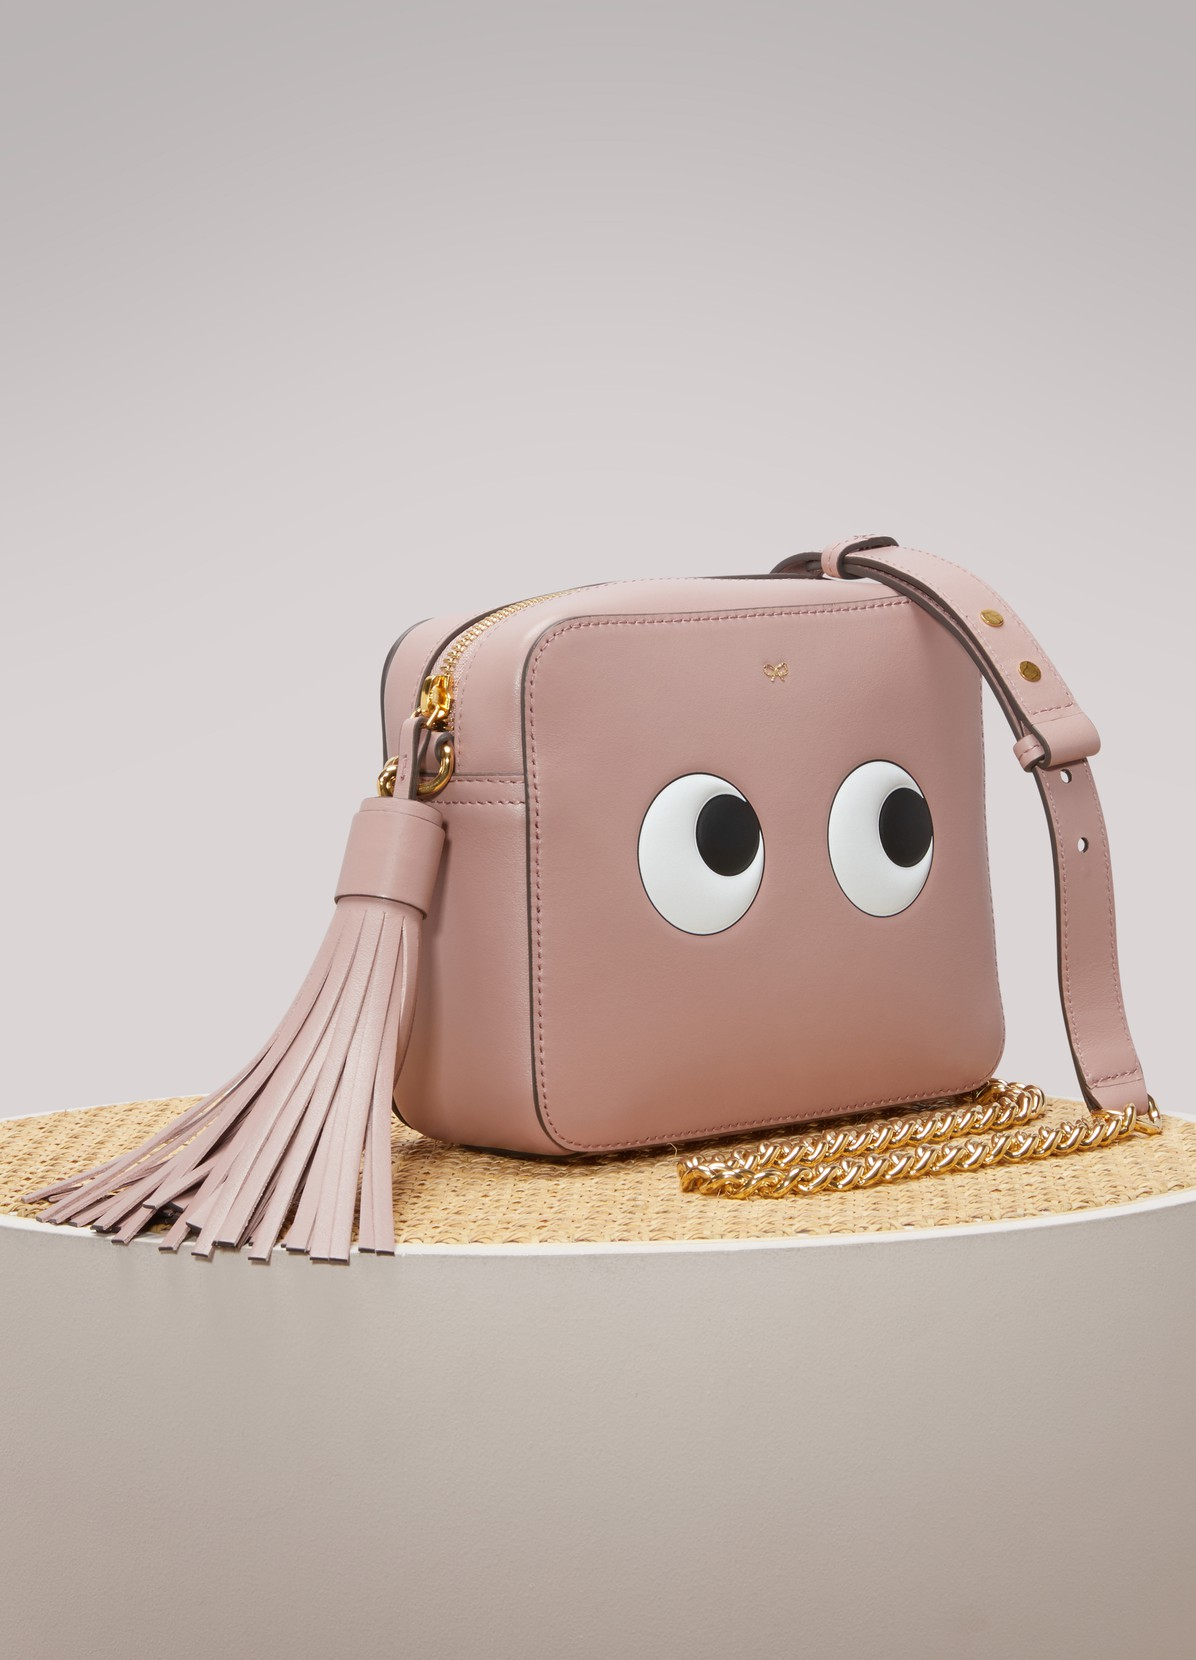 ANYA HINDMARCHEyes Crossbody Bag